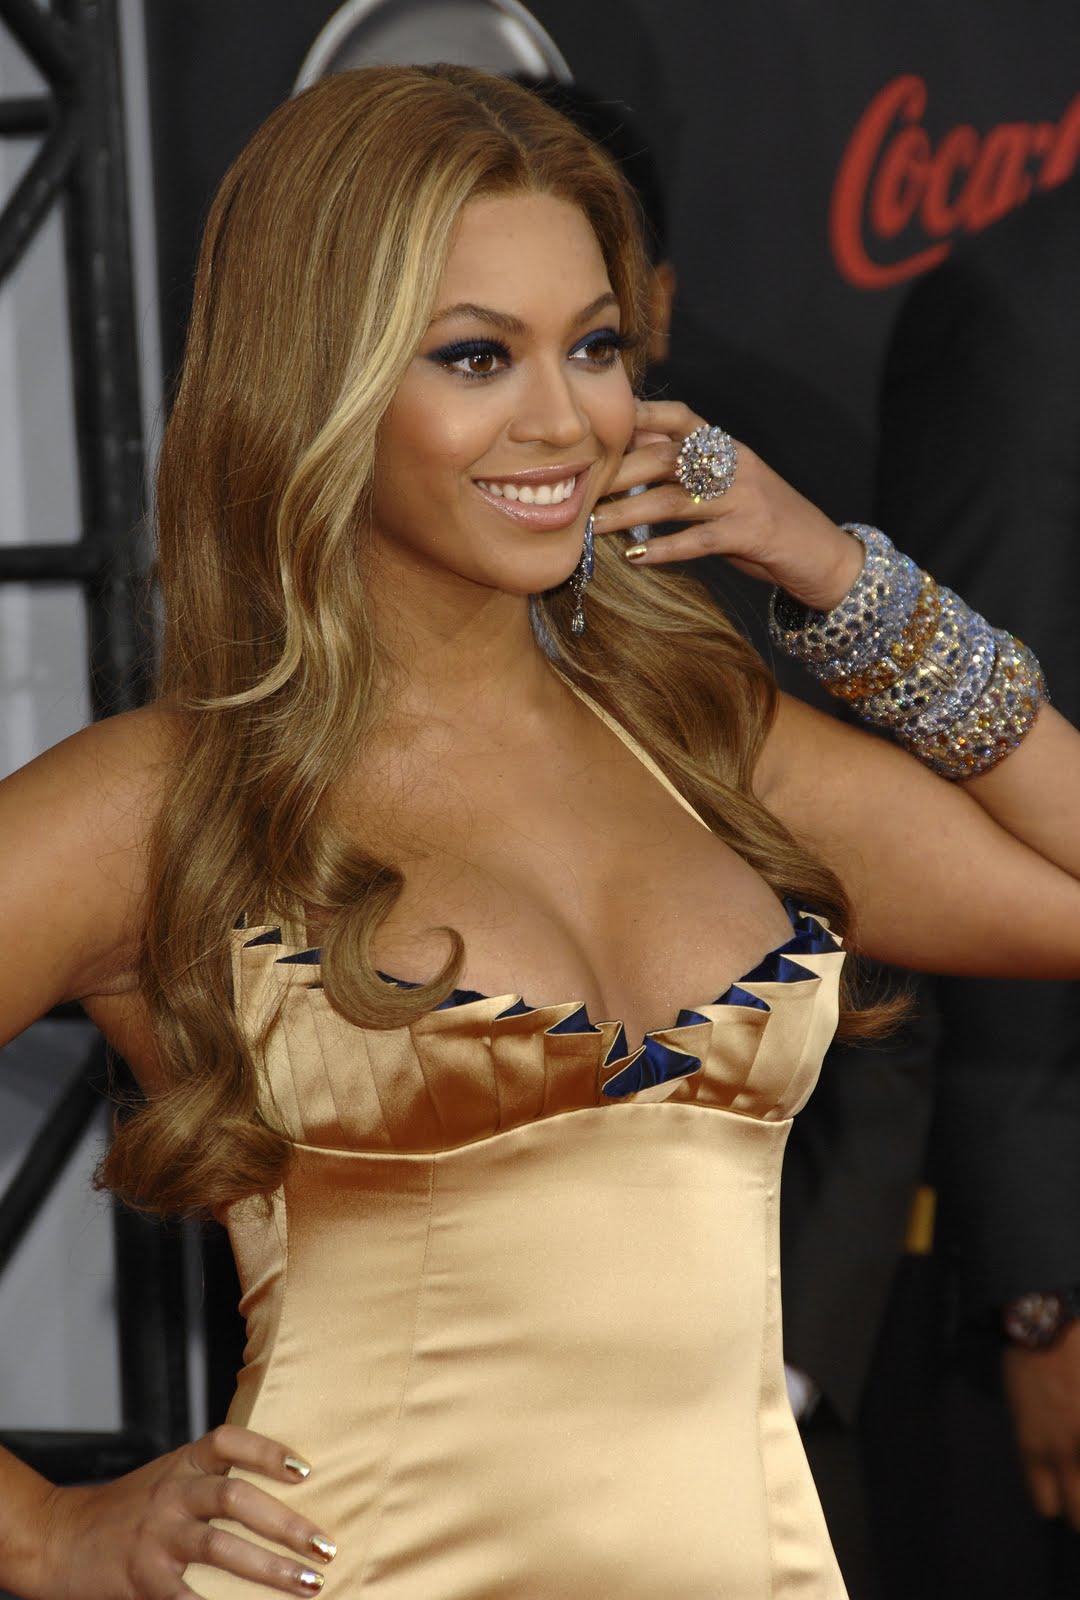 http://2.bp.blogspot.com/-dWQdS37U-F8/Tdq8UJkcV3I/AAAAAAAAIxU/1-sviTW1ZmI/s1600/35286_Celebutopia-Beyonce-2007_American_Music_Awards_Arrivals-19_123_1028lo.jpg